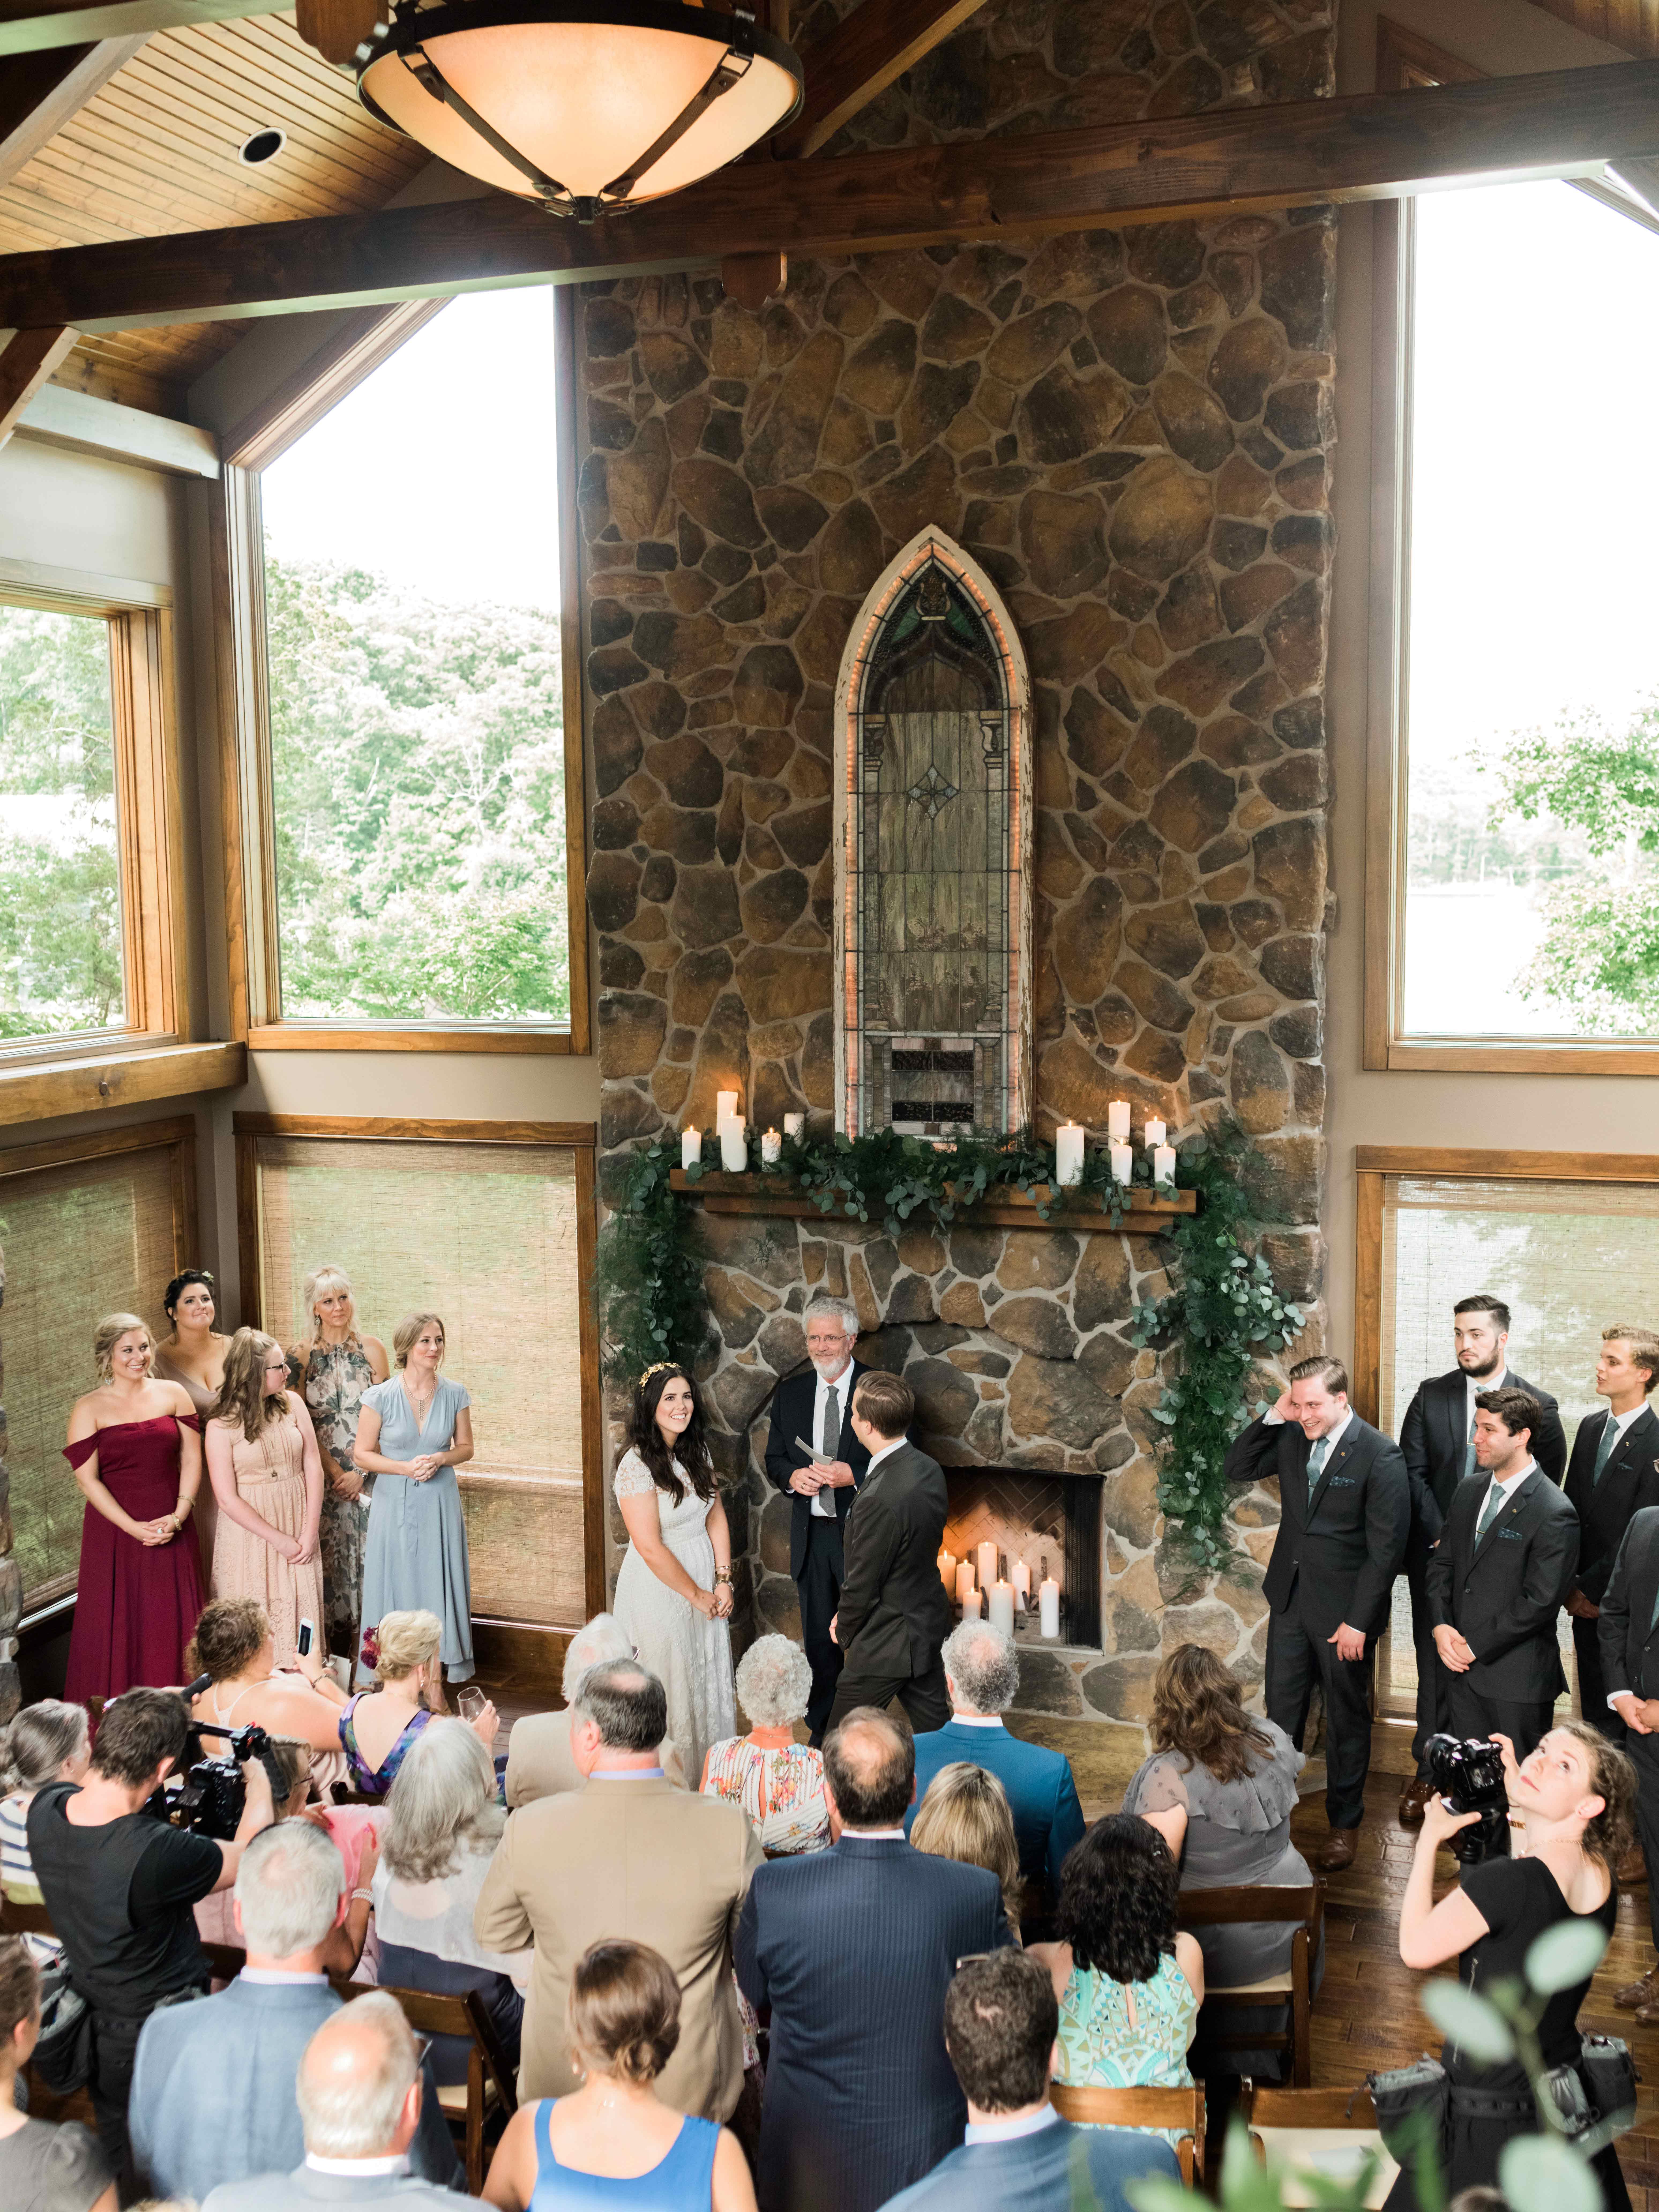 chrissy and jons indoor wedding ceremony